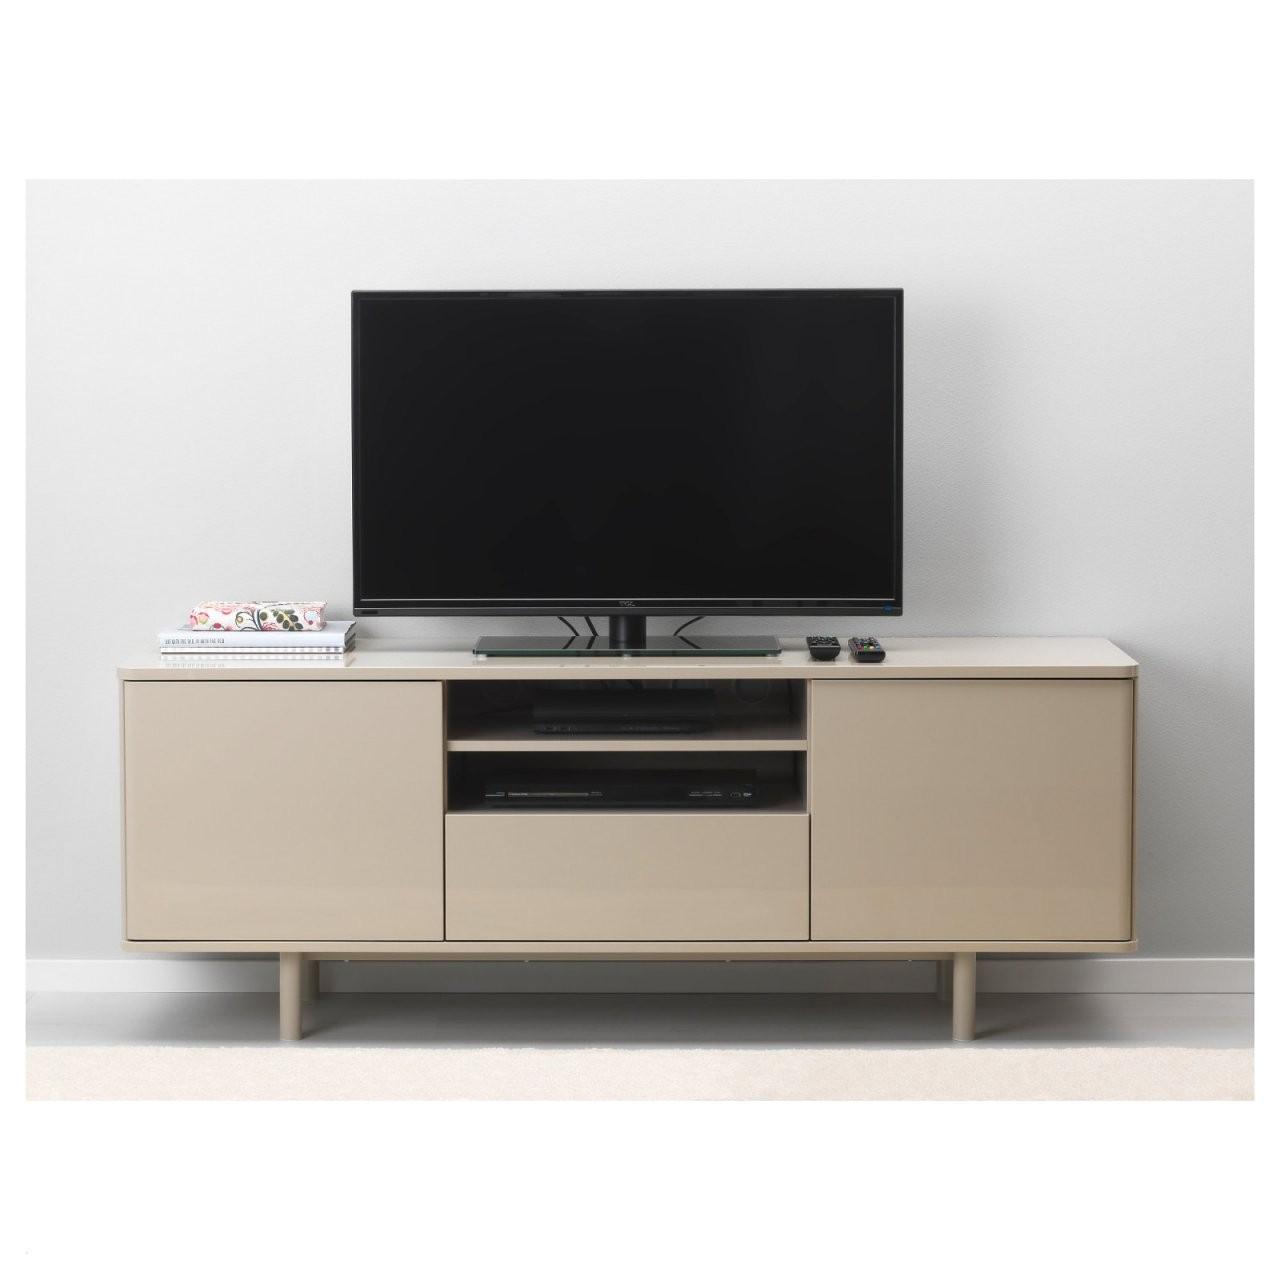 35 Impressionnant Tv Lowboard Selber Bauen Bauanleitung  Ahhadesigns von Tv Lowboard Selber Bauen Bauanleitung Bild